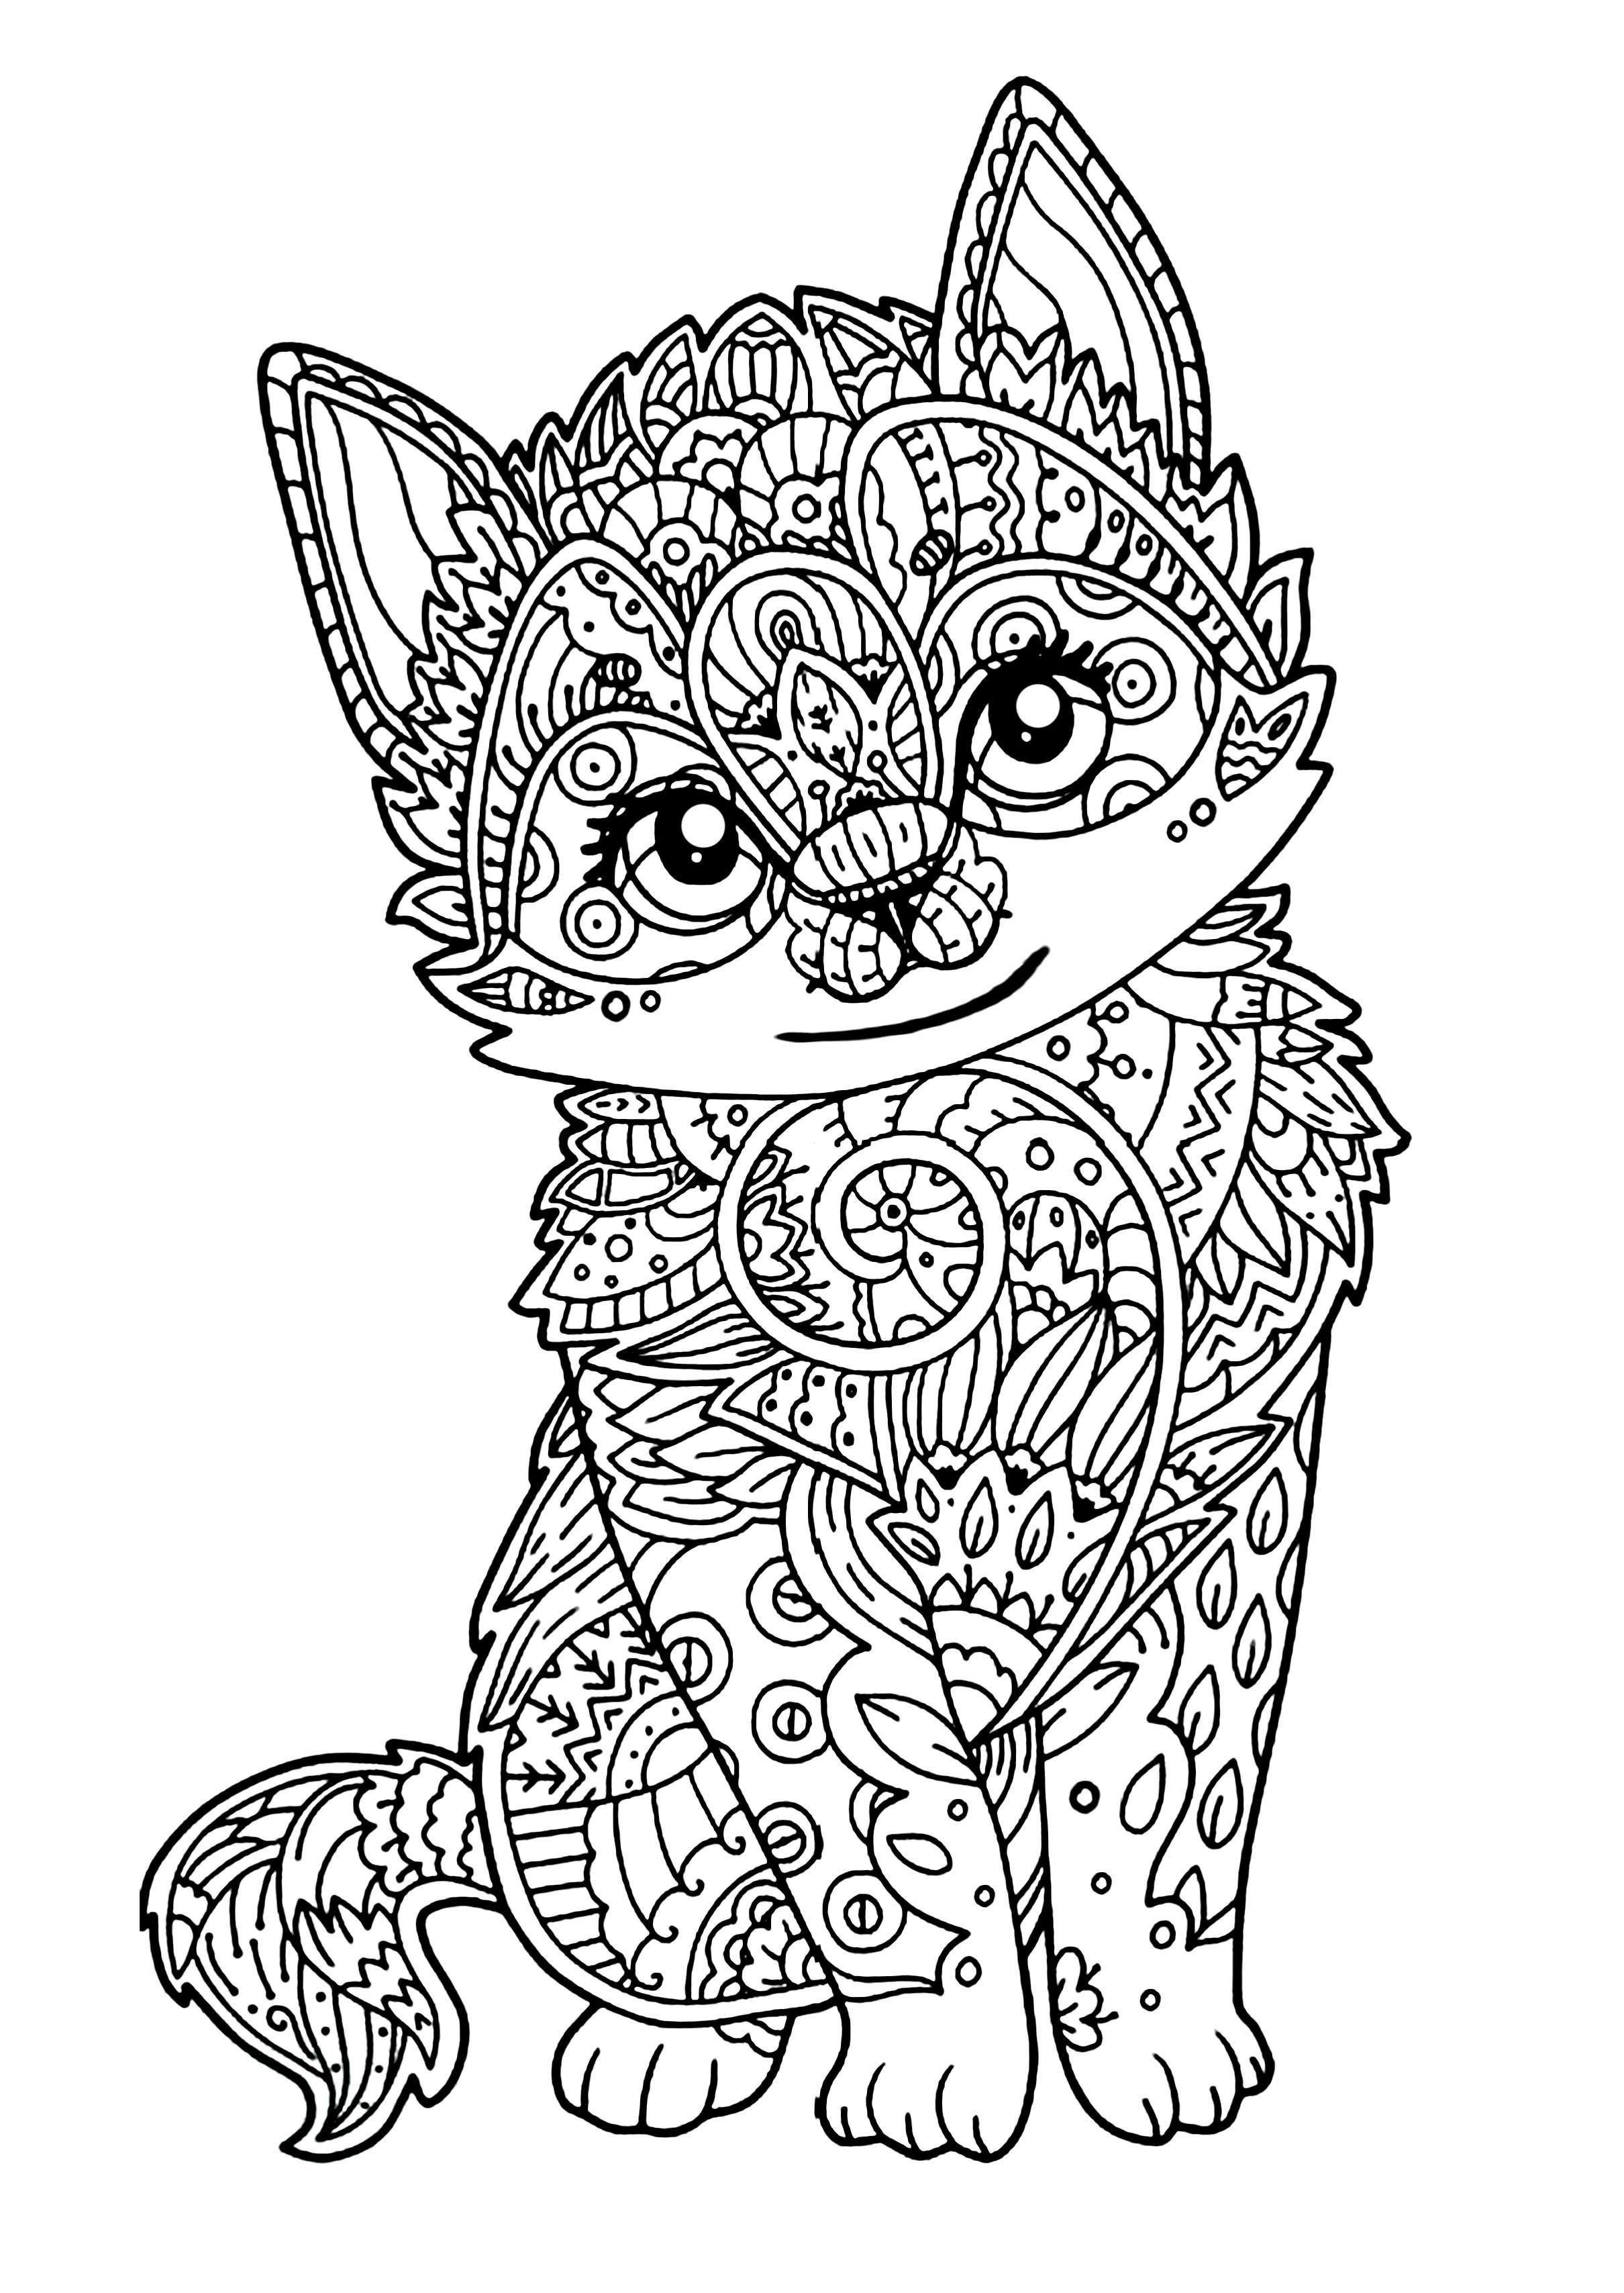 Coloring Mandala Cat Printllllll L Duilawyerlosangeles ...   mandala colouring sheets animals